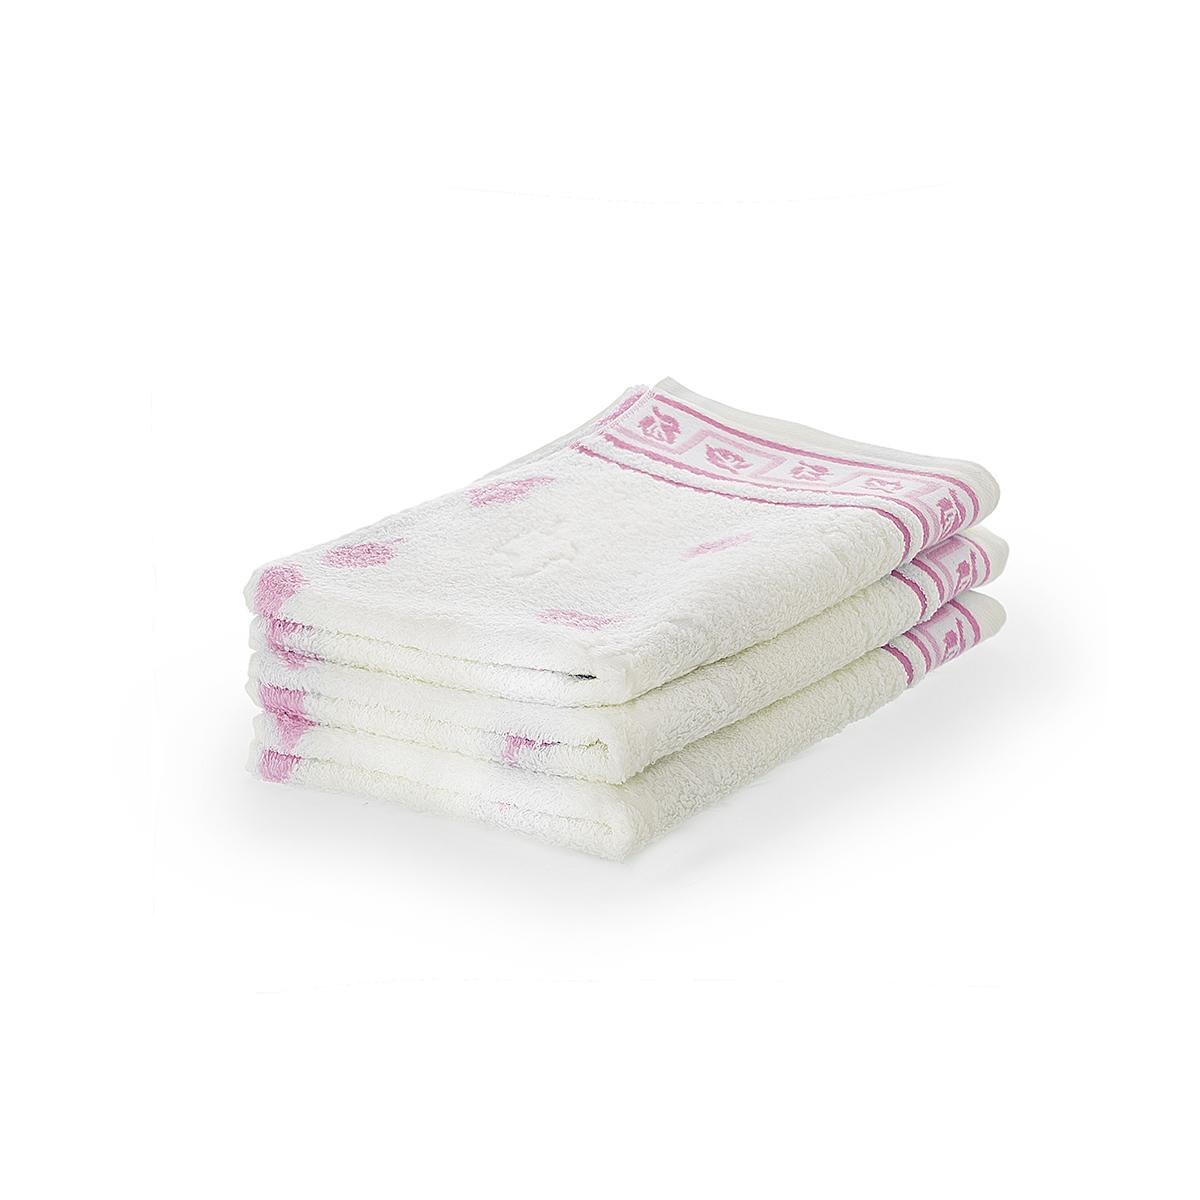 Полотенце Листопад Розовый, размер 65х135 смМахровые полотенца<br>Плотность ткани:480 г/кв. м.<br><br>Тип: Полотенце<br>Размер: 65х135<br>Материал: Махра